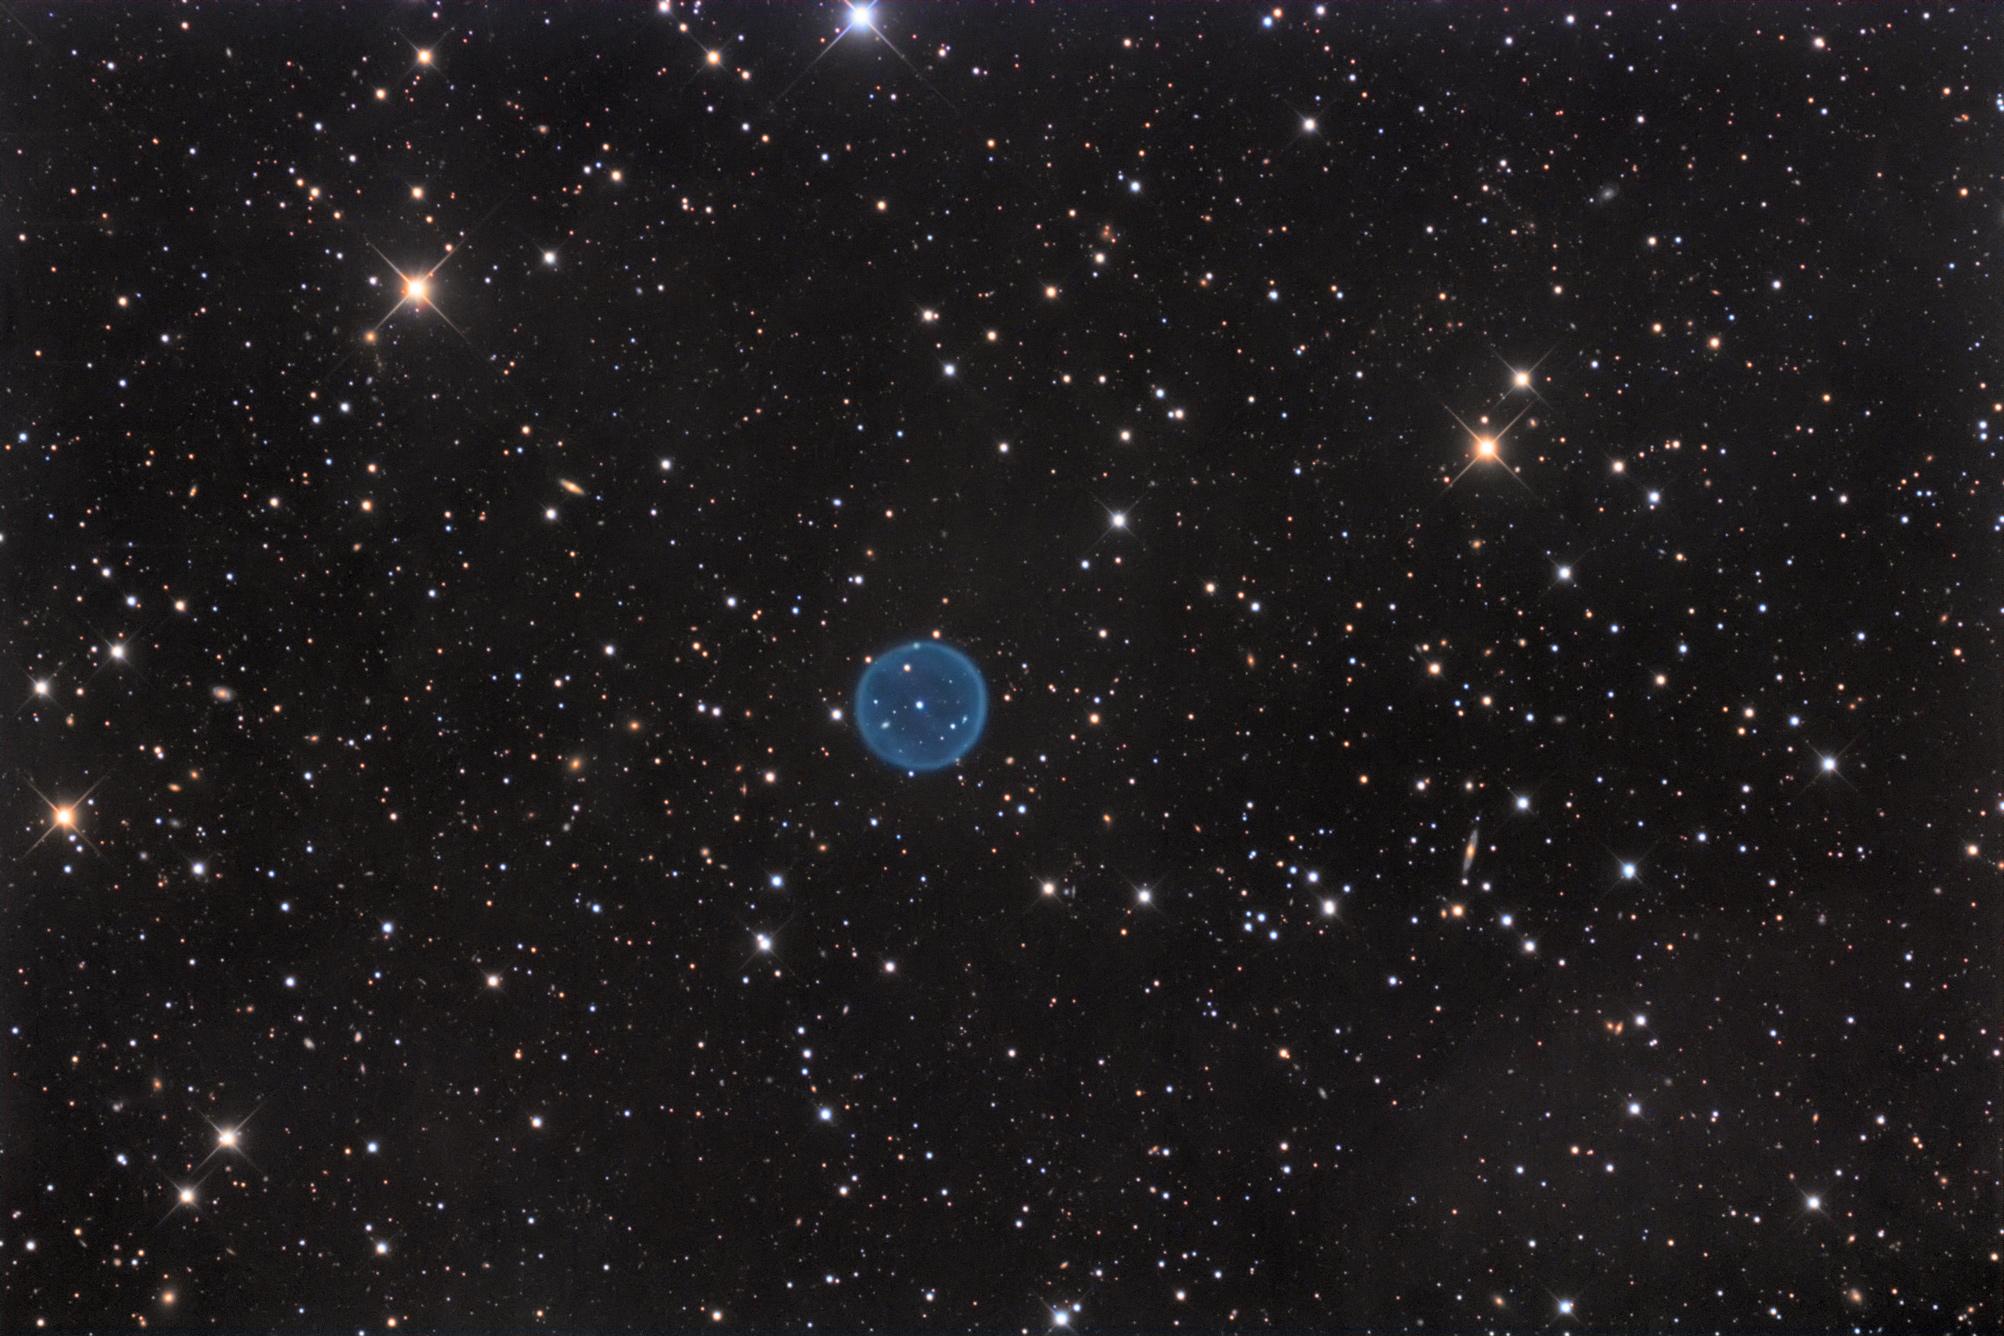 stellar and galactic astronomy uga - HD2004×1336